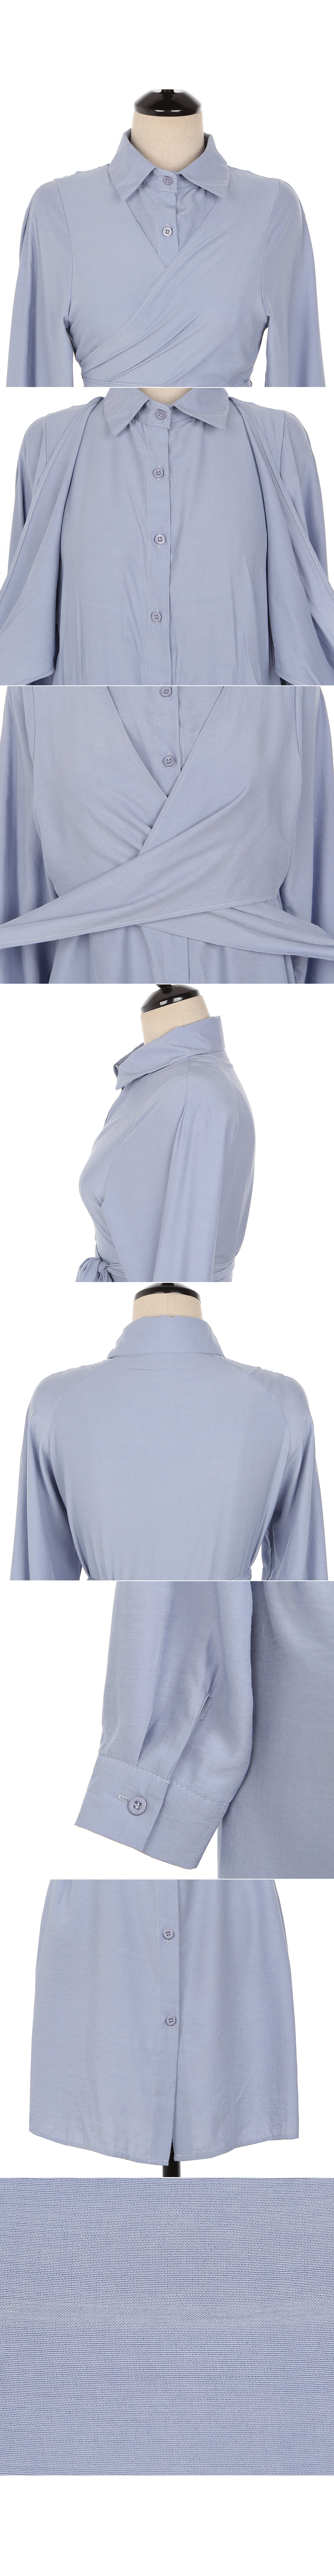 Shirt wraps ops